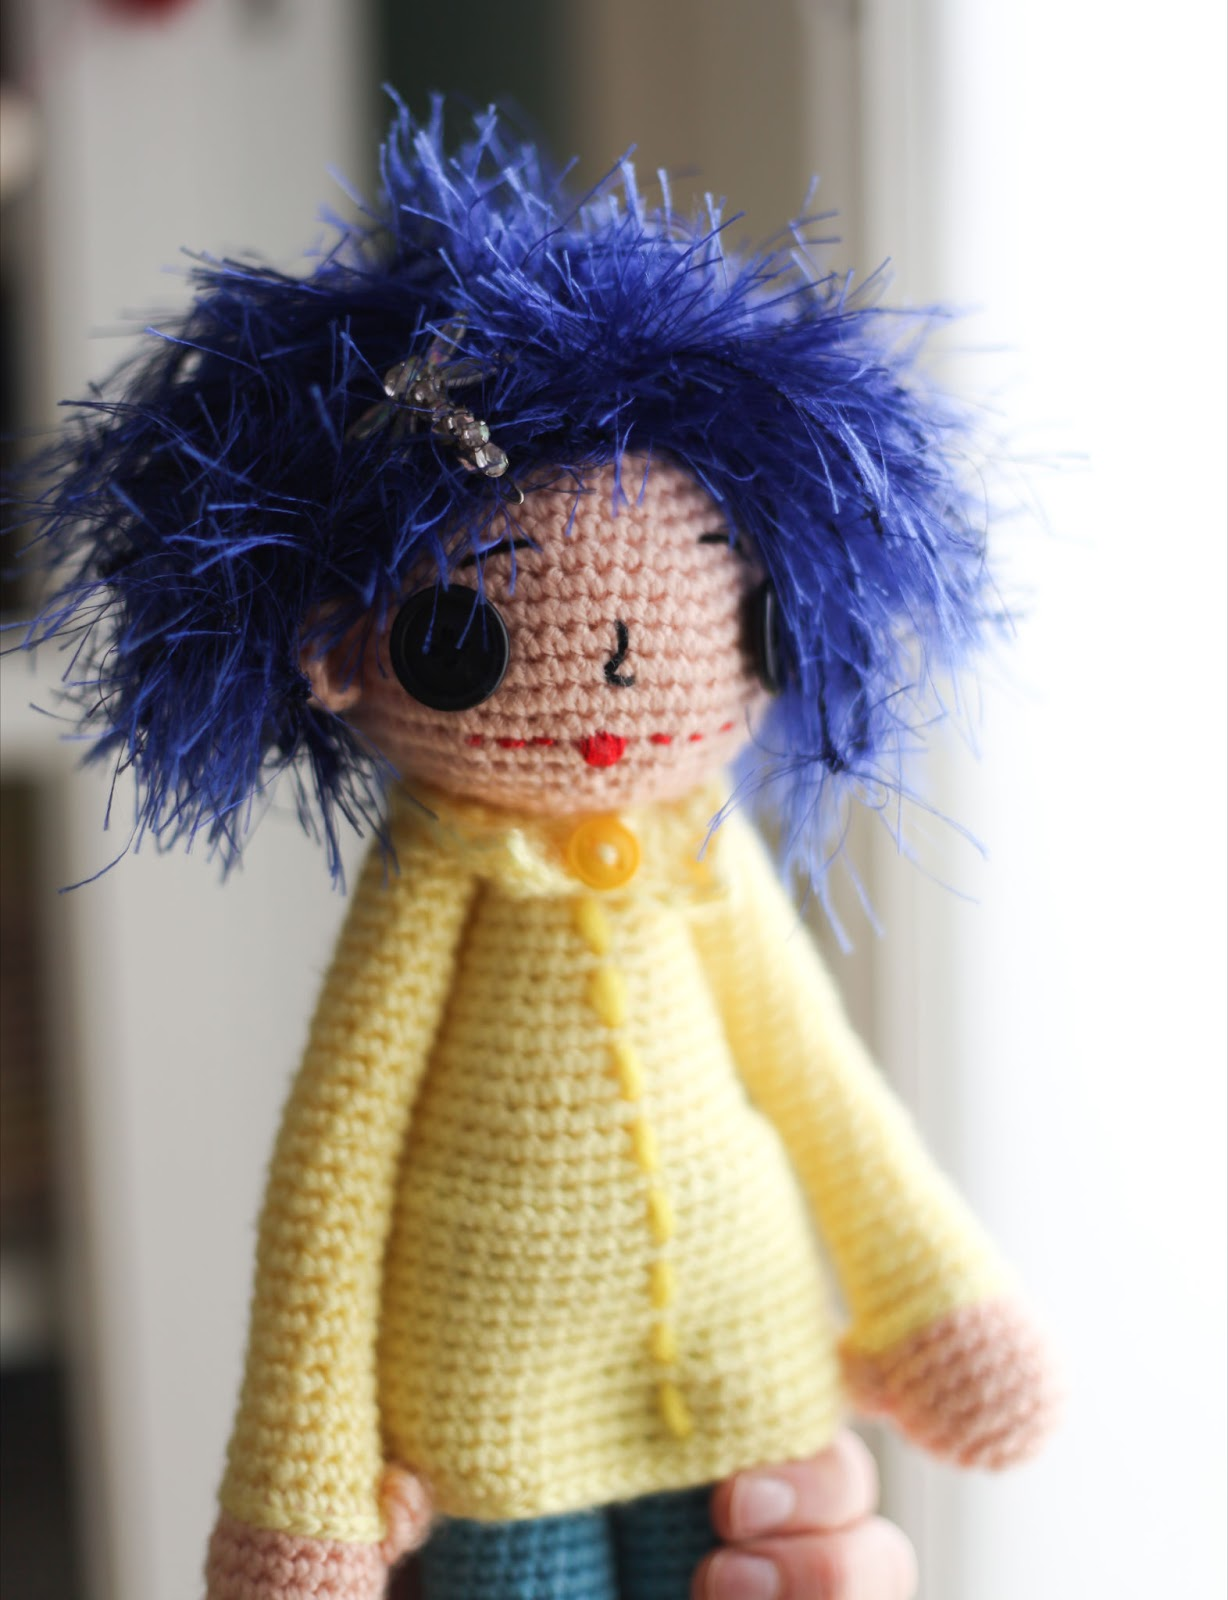 Crochet elf doll amigurumi pattern - Amigurumi Today | 1600x1228